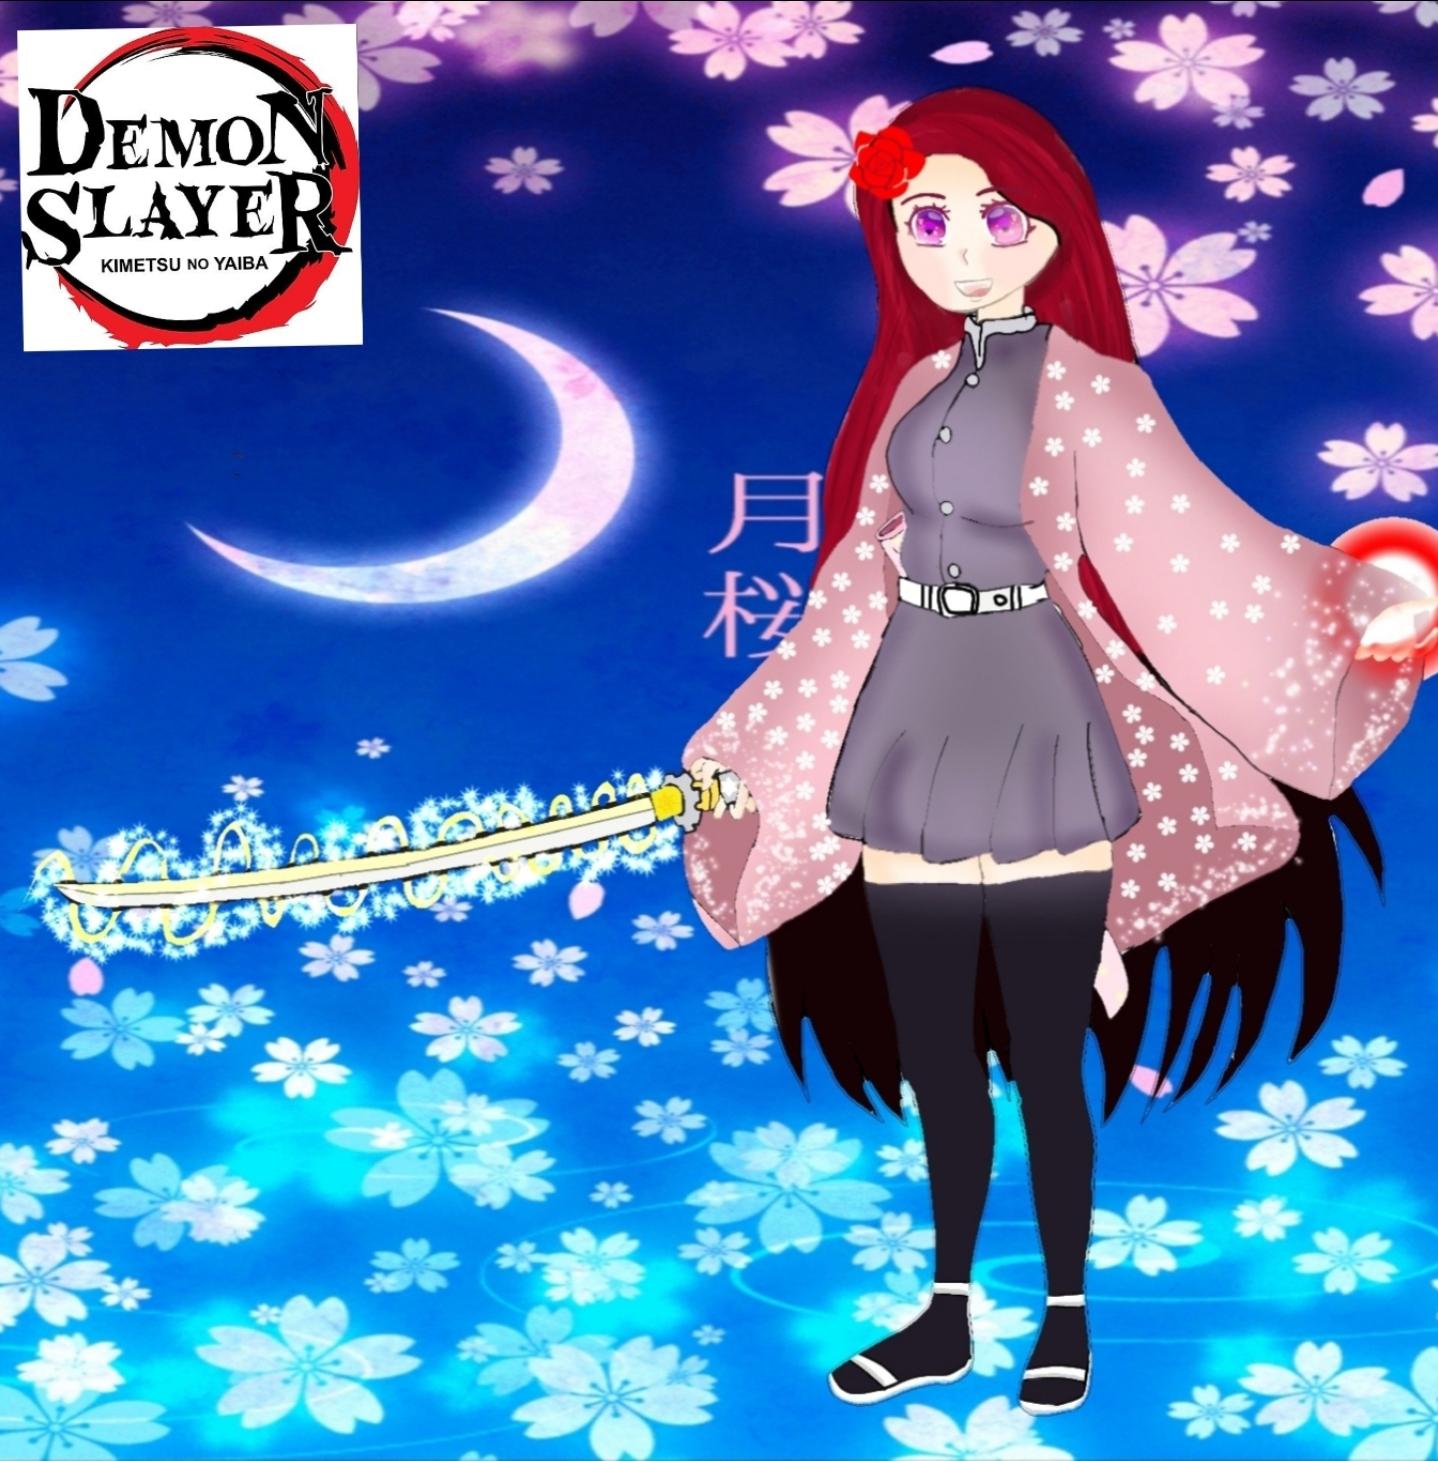 Demon Slayer Oc Fandom A great challenge for me to play this character. demon slayer oc fandom